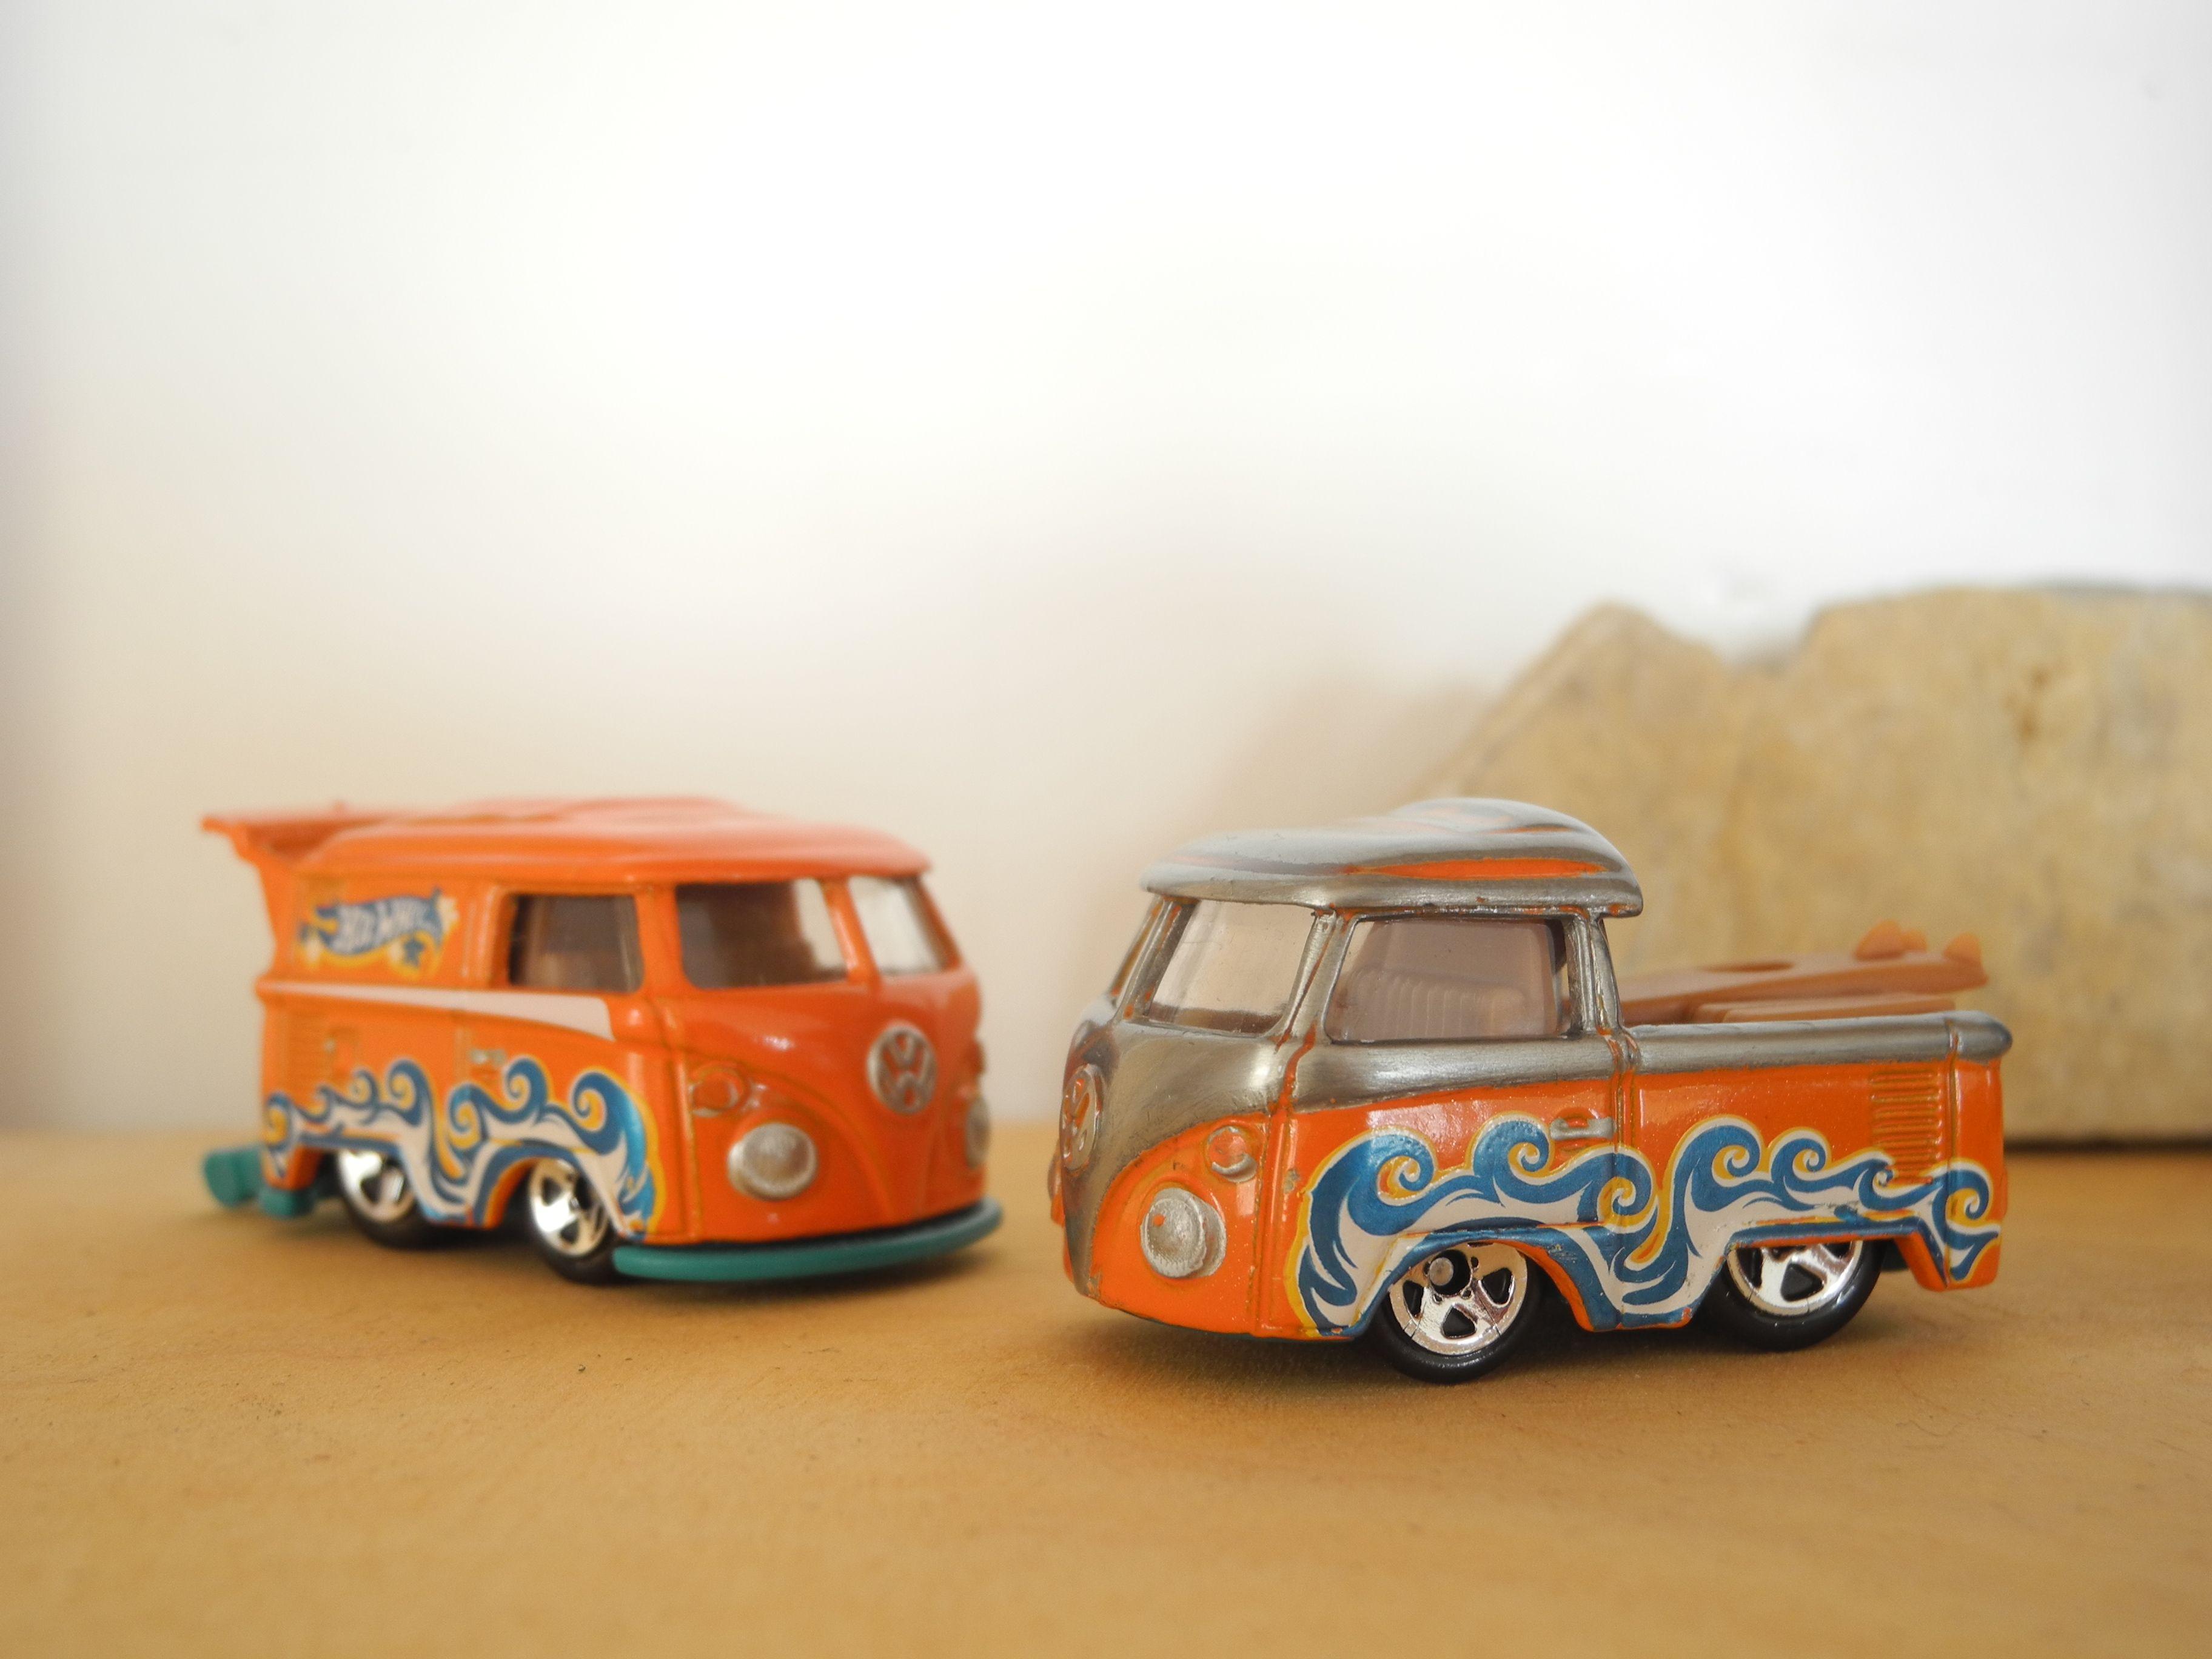 2dcustoms volkswagen kool kombi hot wheels vw. Black Bedroom Furniture Sets. Home Design Ideas